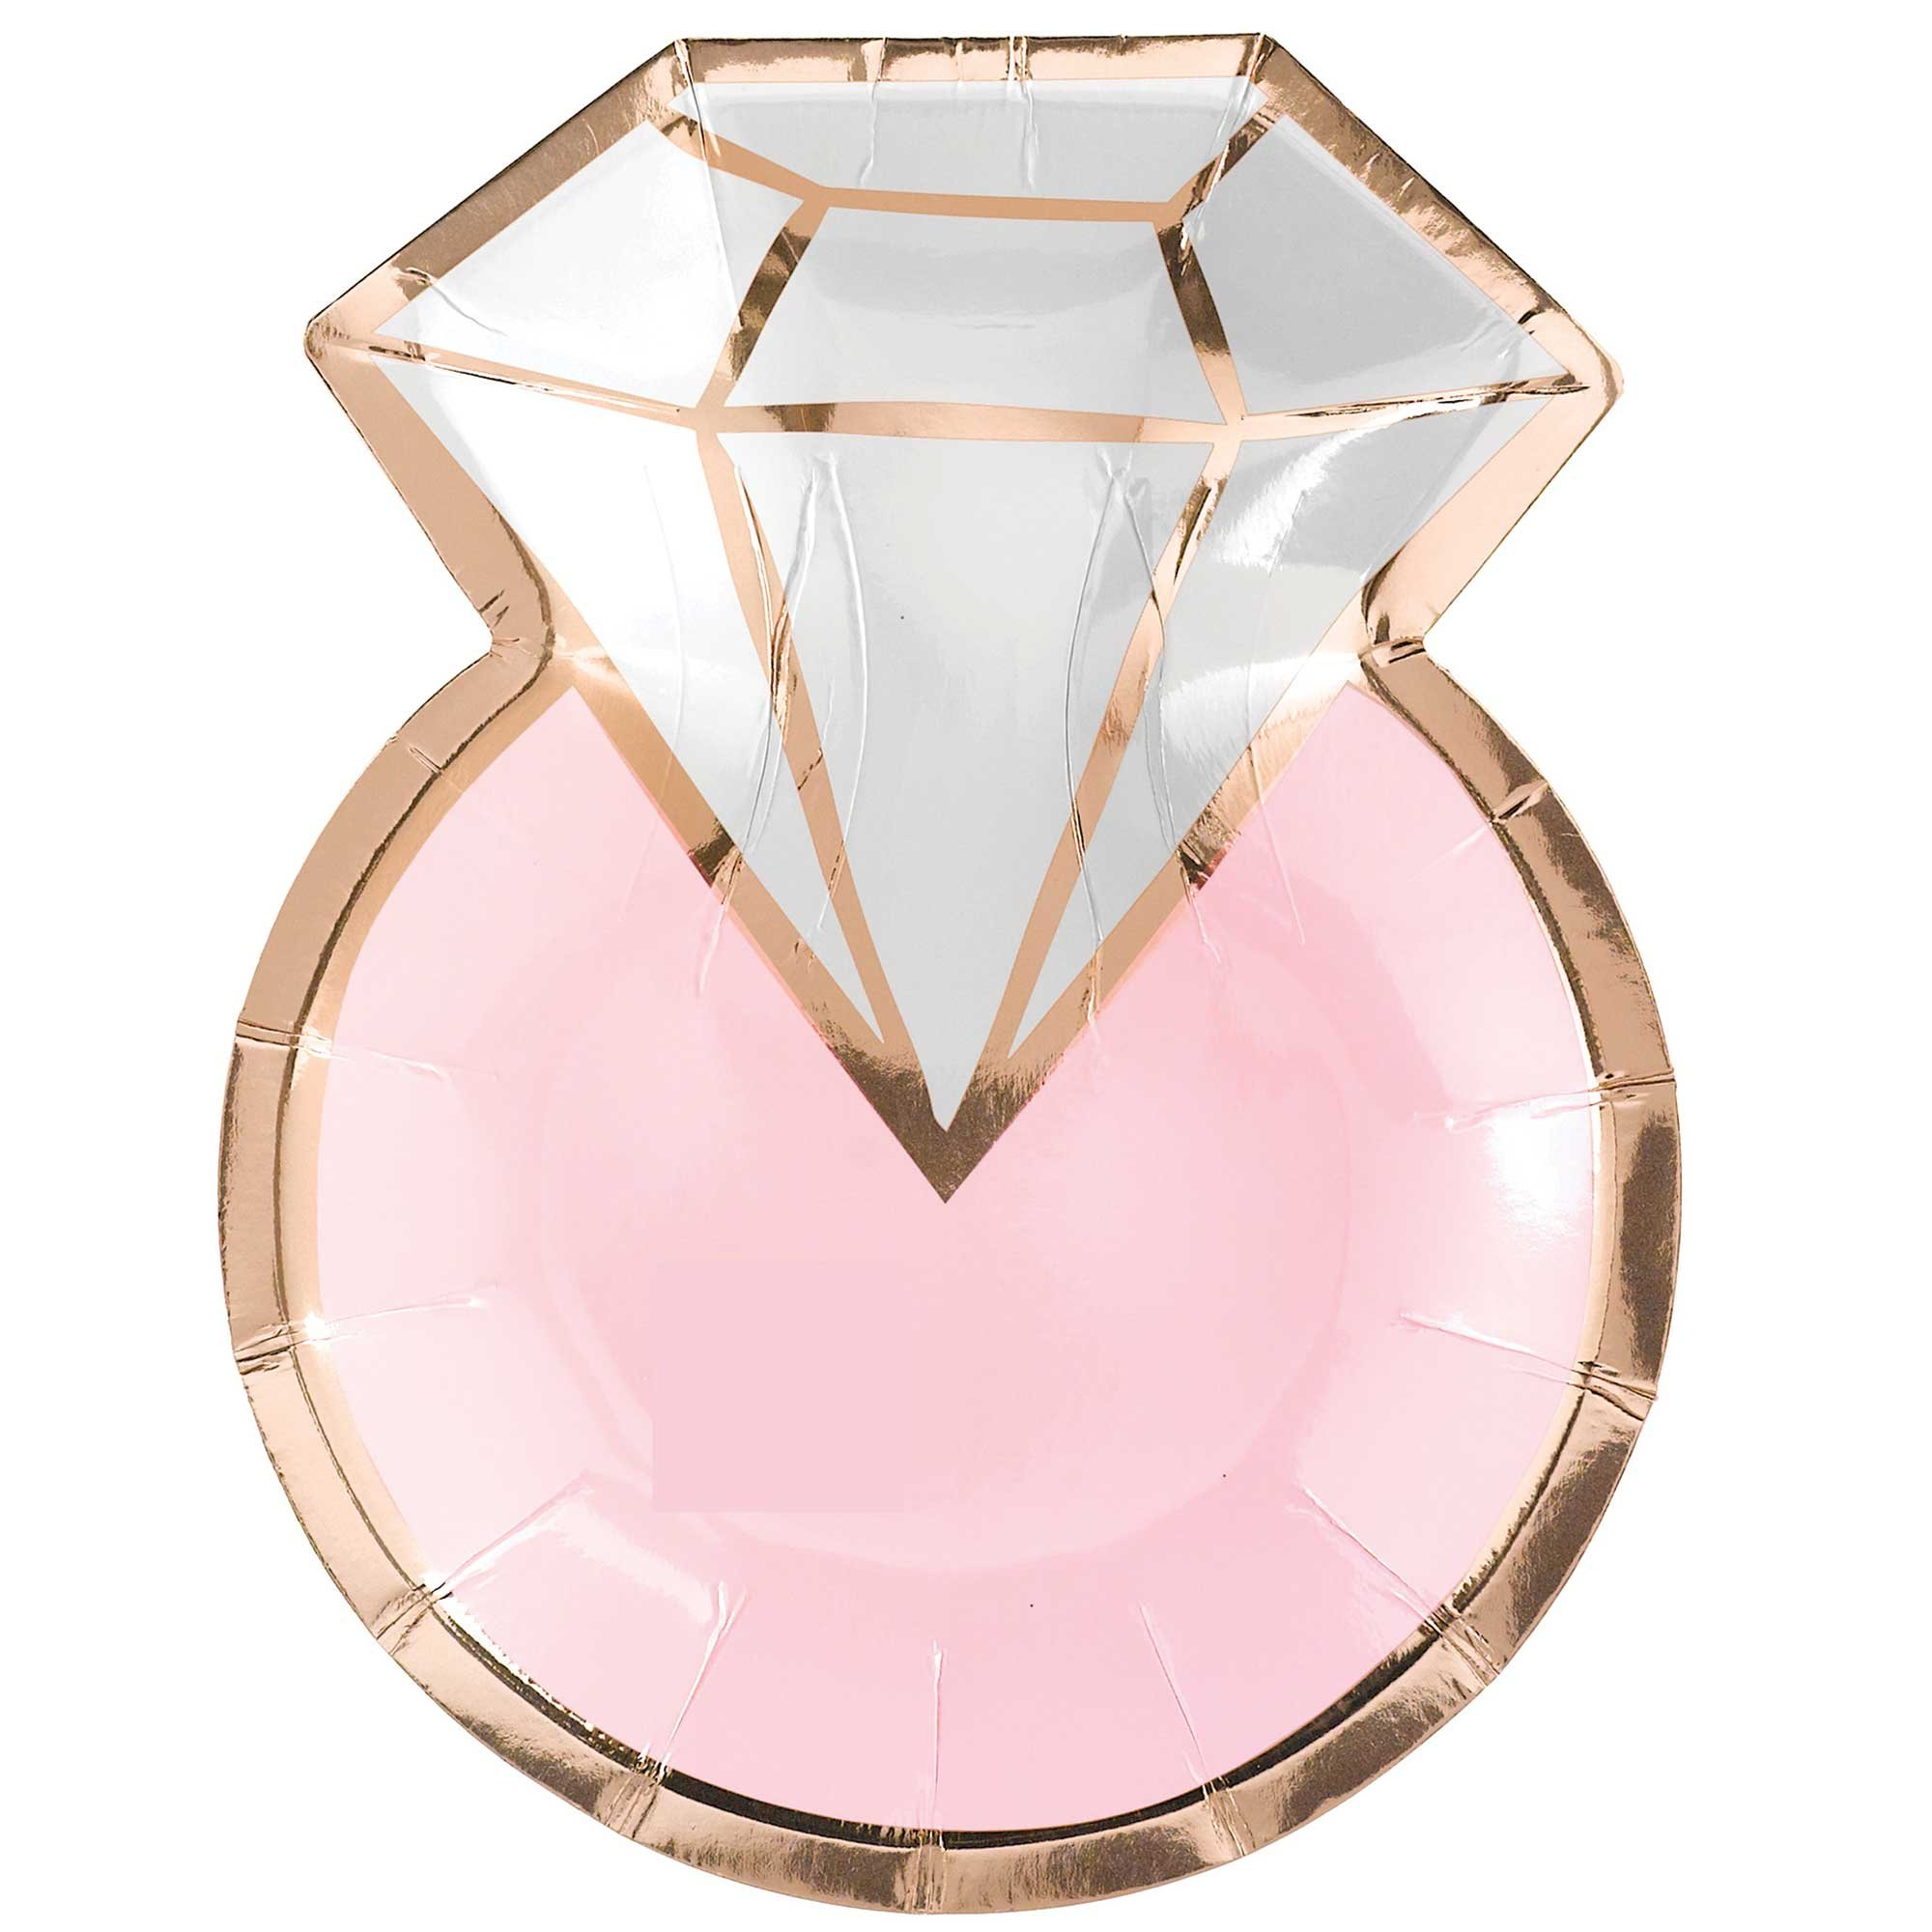 """Blush Wedding 7""""/ 17cm Metallic Shapes Plates Diamond Ring"